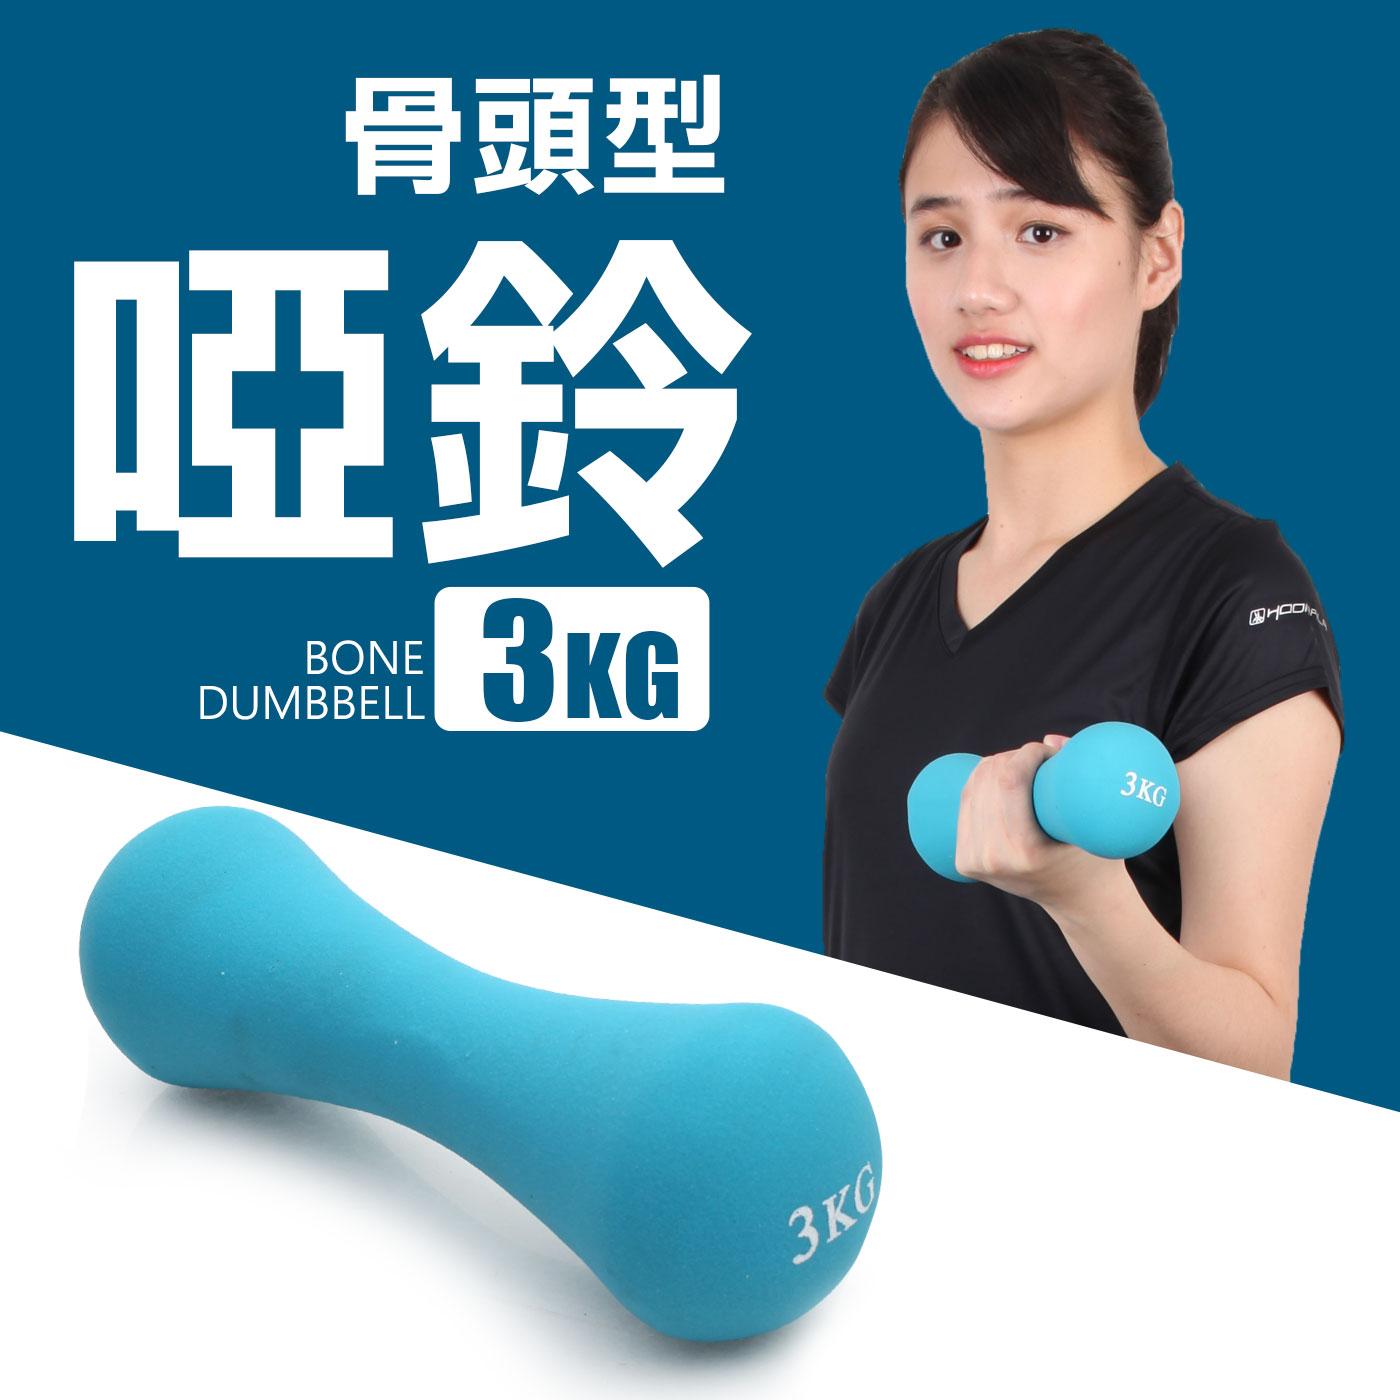 MDBuddy 骨頭型啞鈴(3KG)(健身 重量訓練【99301234】≡排汗專家≡